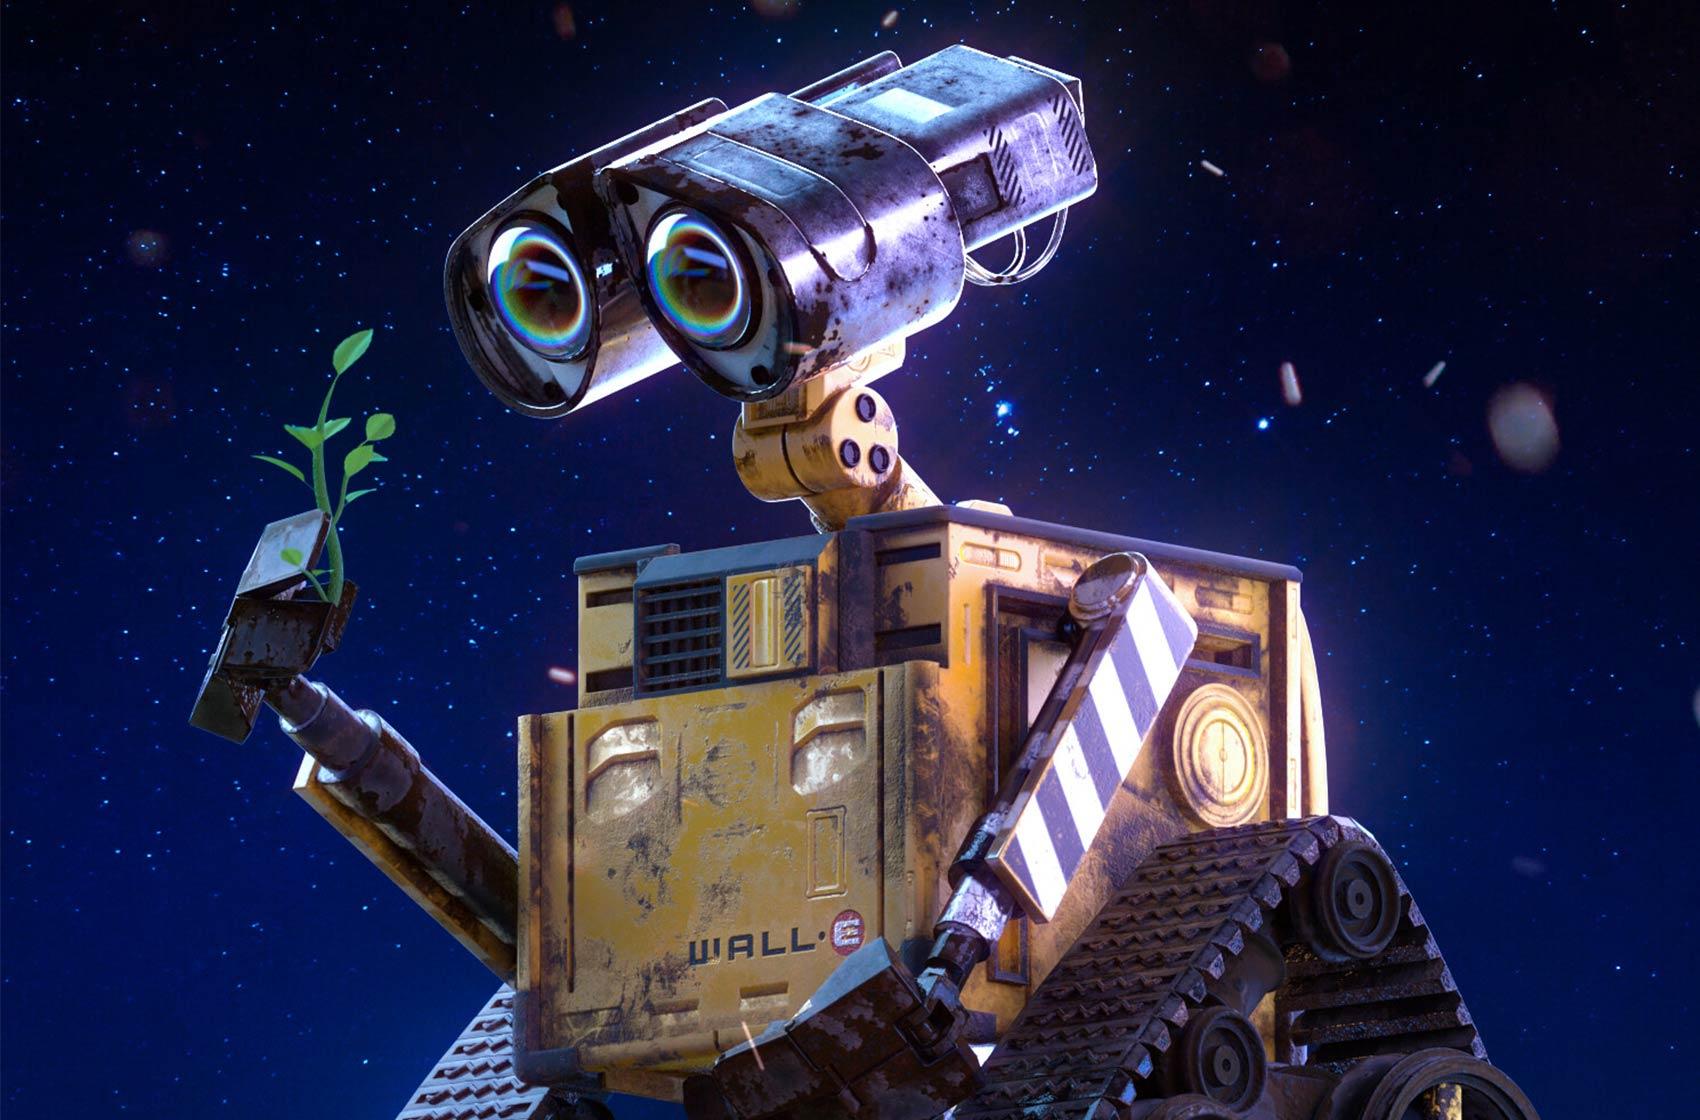 Wall-E - Meilleurs films Disney plus